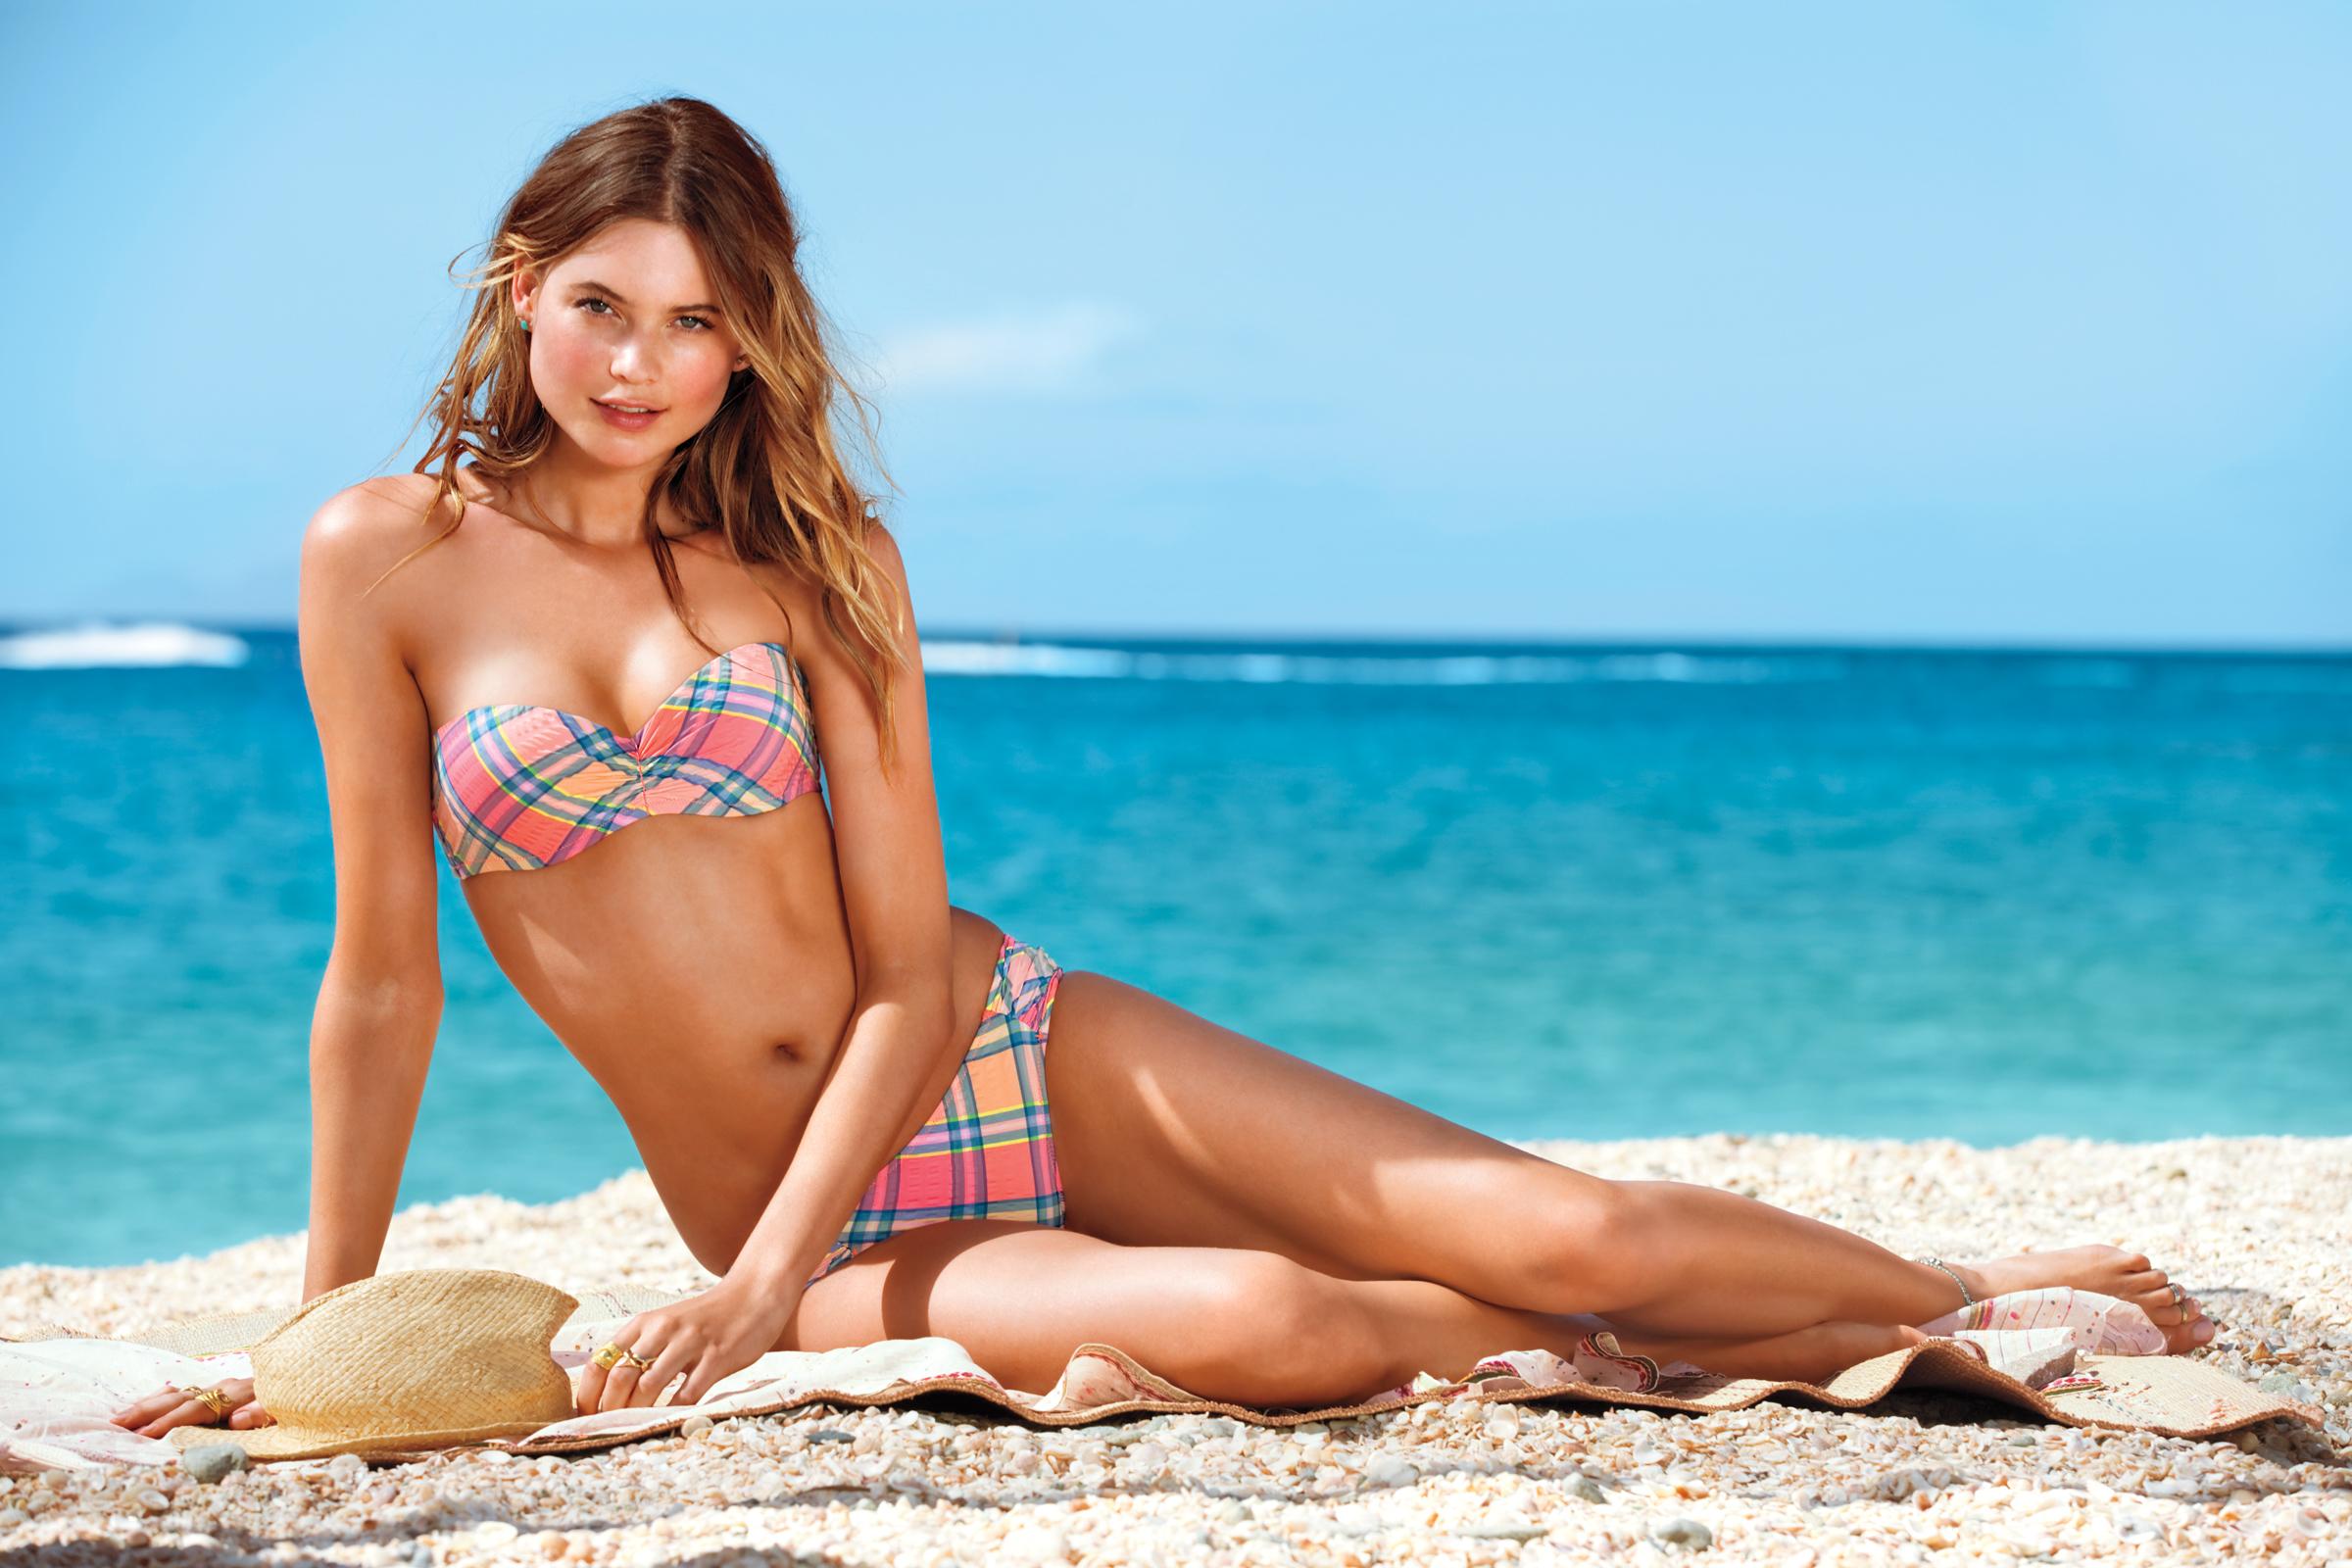 пляж и девушки фото-тн1